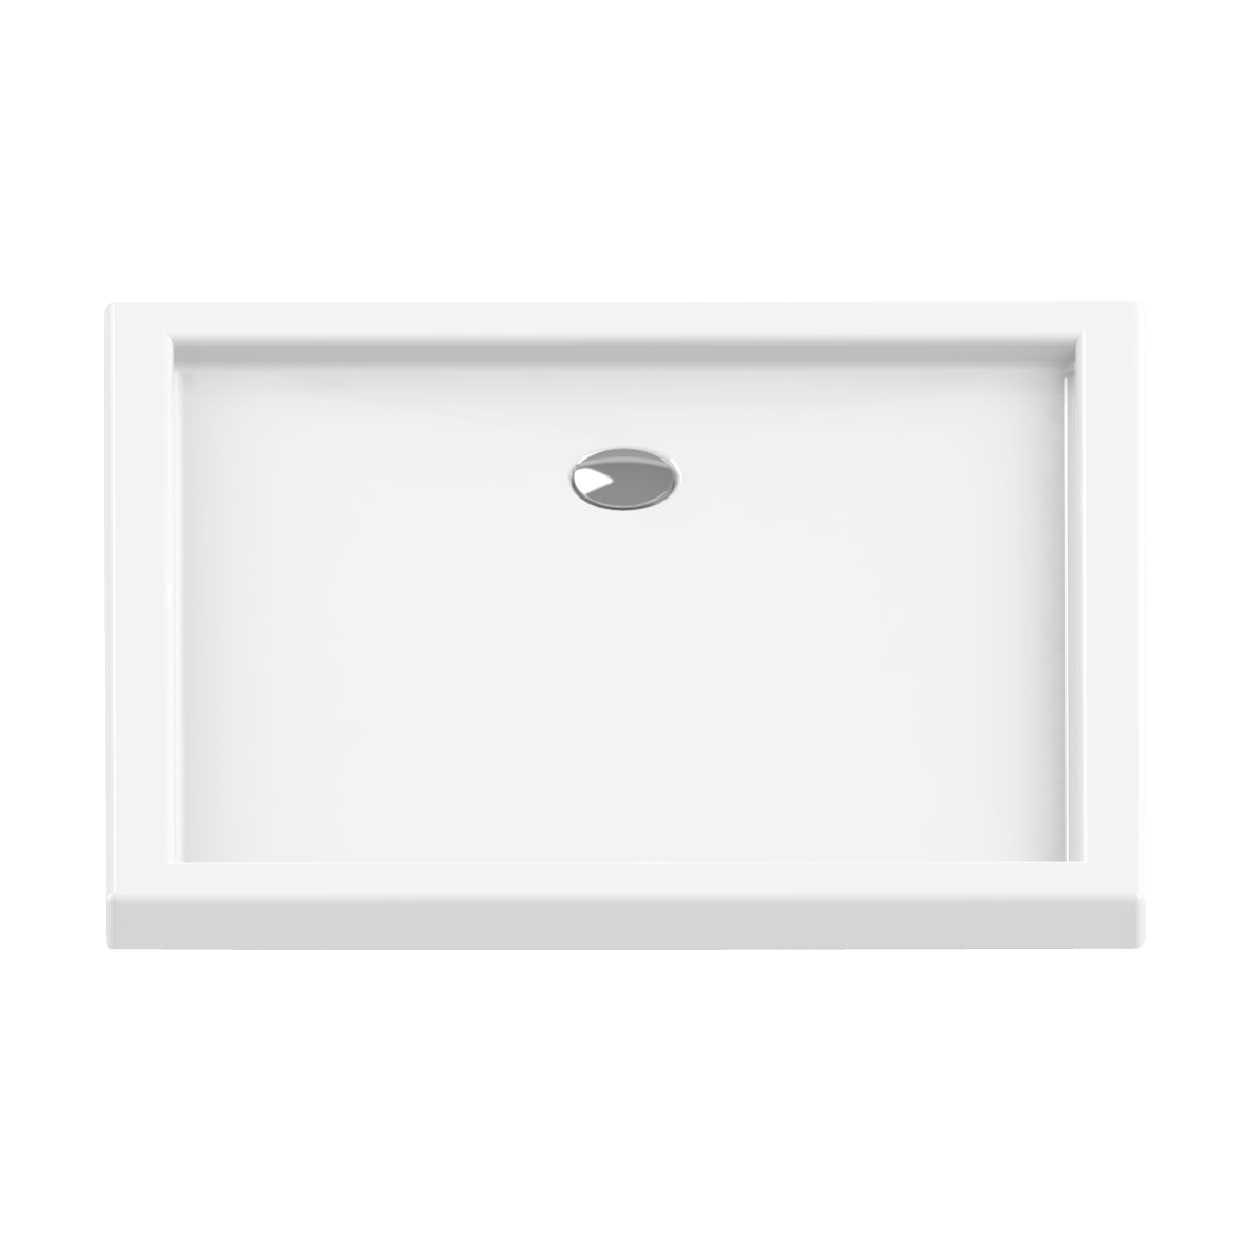 New Trendy |  Brodzik CANTARE 110 x 80 x 6 cm    B-0324